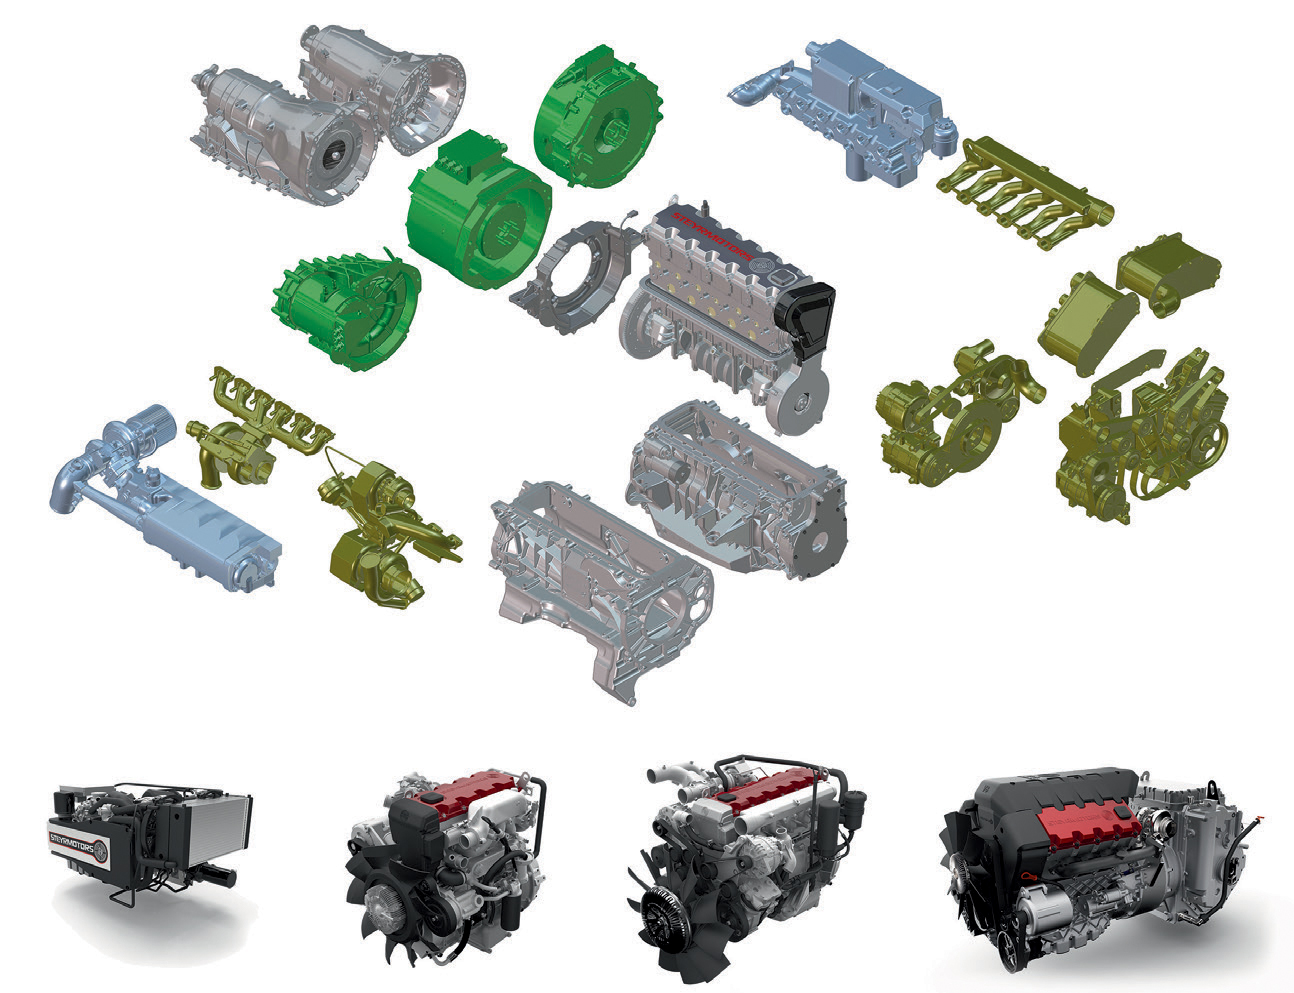 Diesel Power Module For Electrification Of Extra Mile Springerlink I Force V8 5 7 Litre Engine Diagram Open Image In New Window